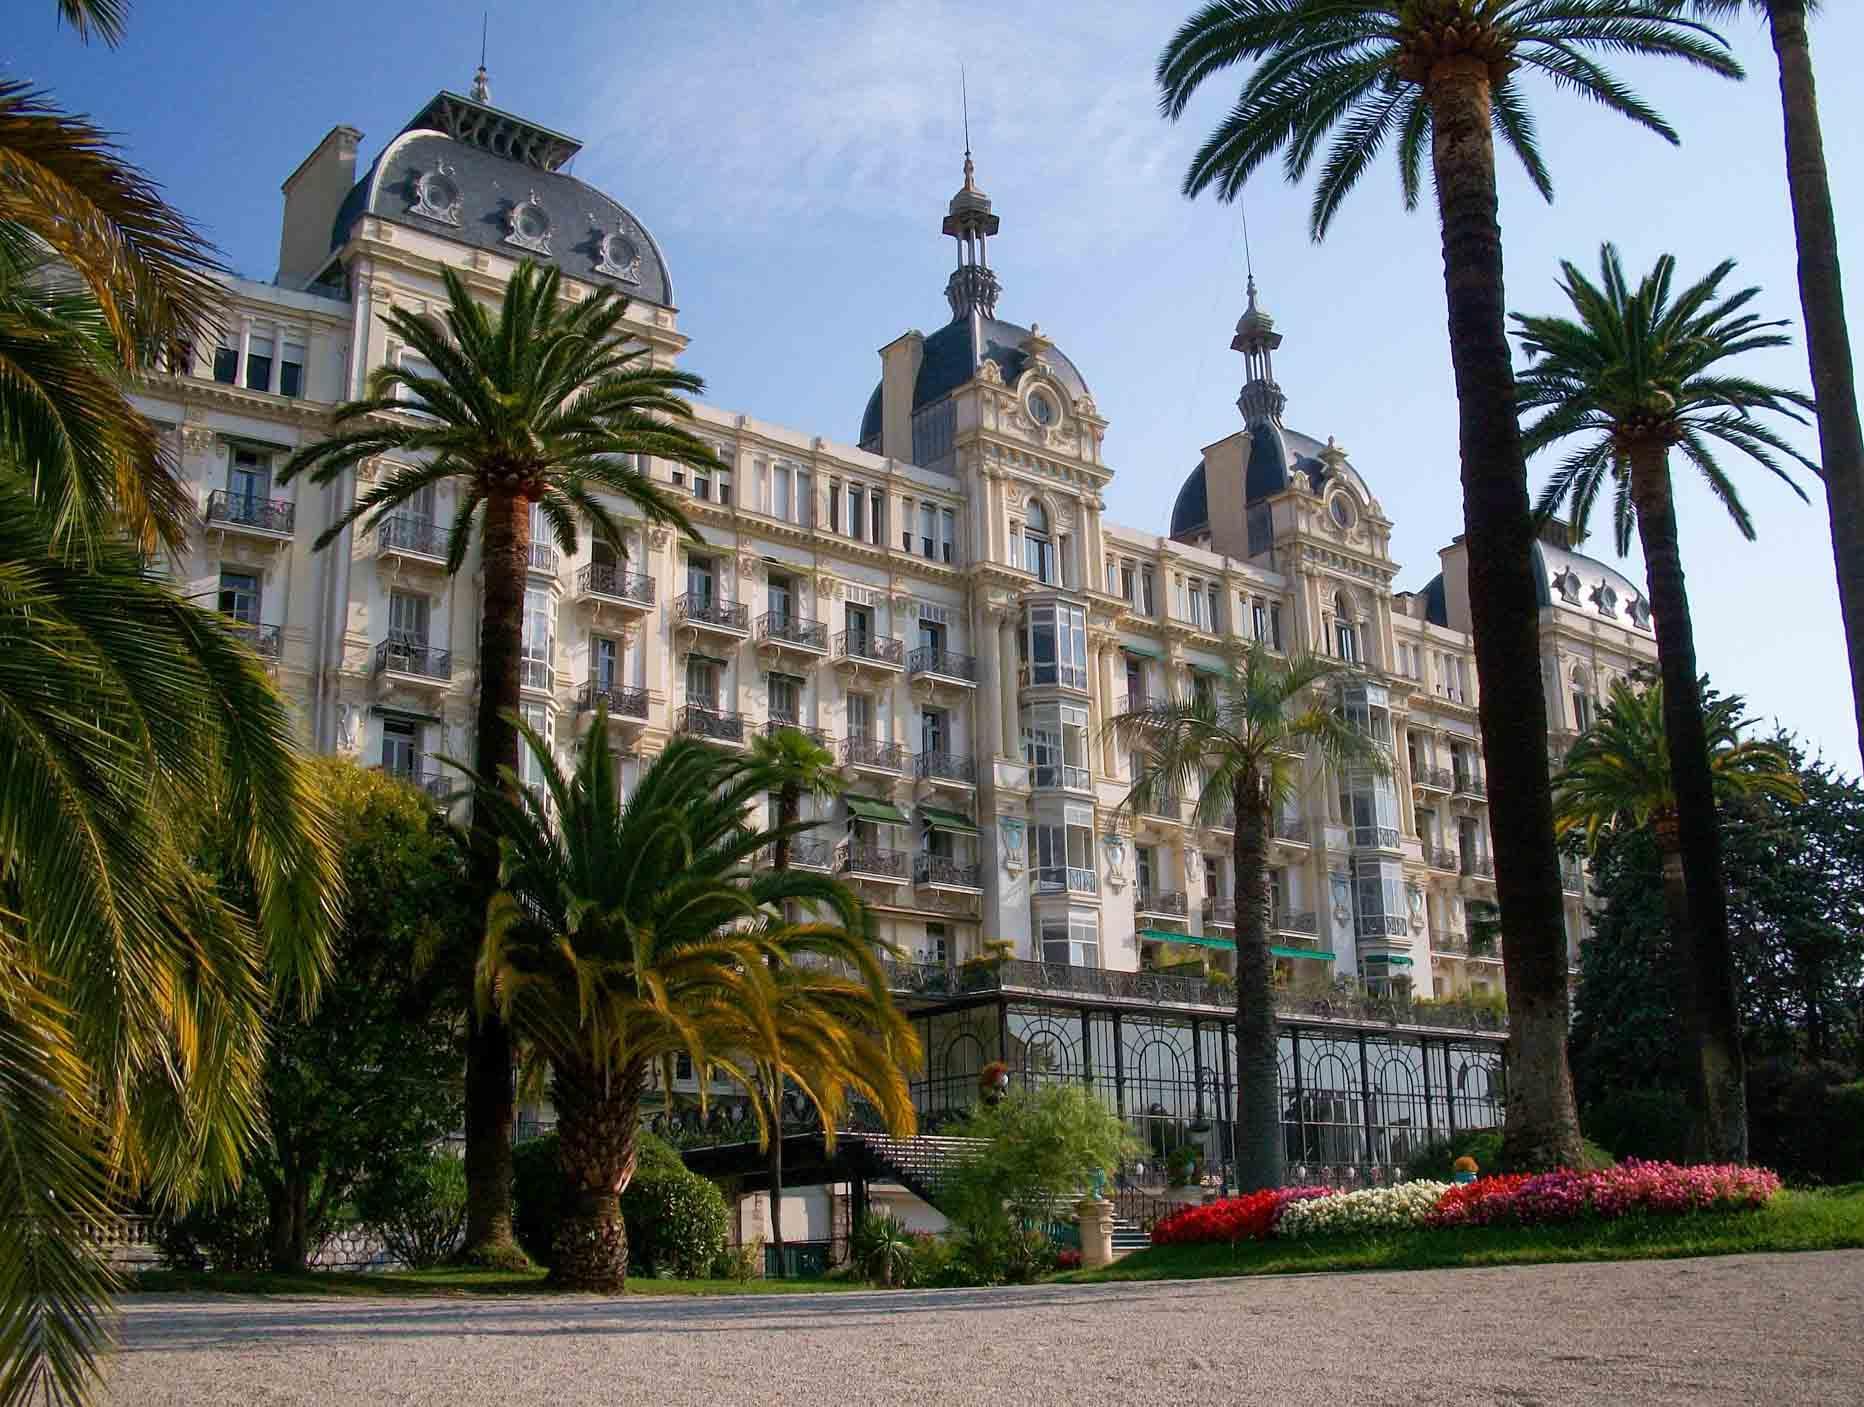 L'ancien Excelsior Hôtel Regina à Nice © Velvetia, CC BY-SA 3.0, via Wikimedia Commons